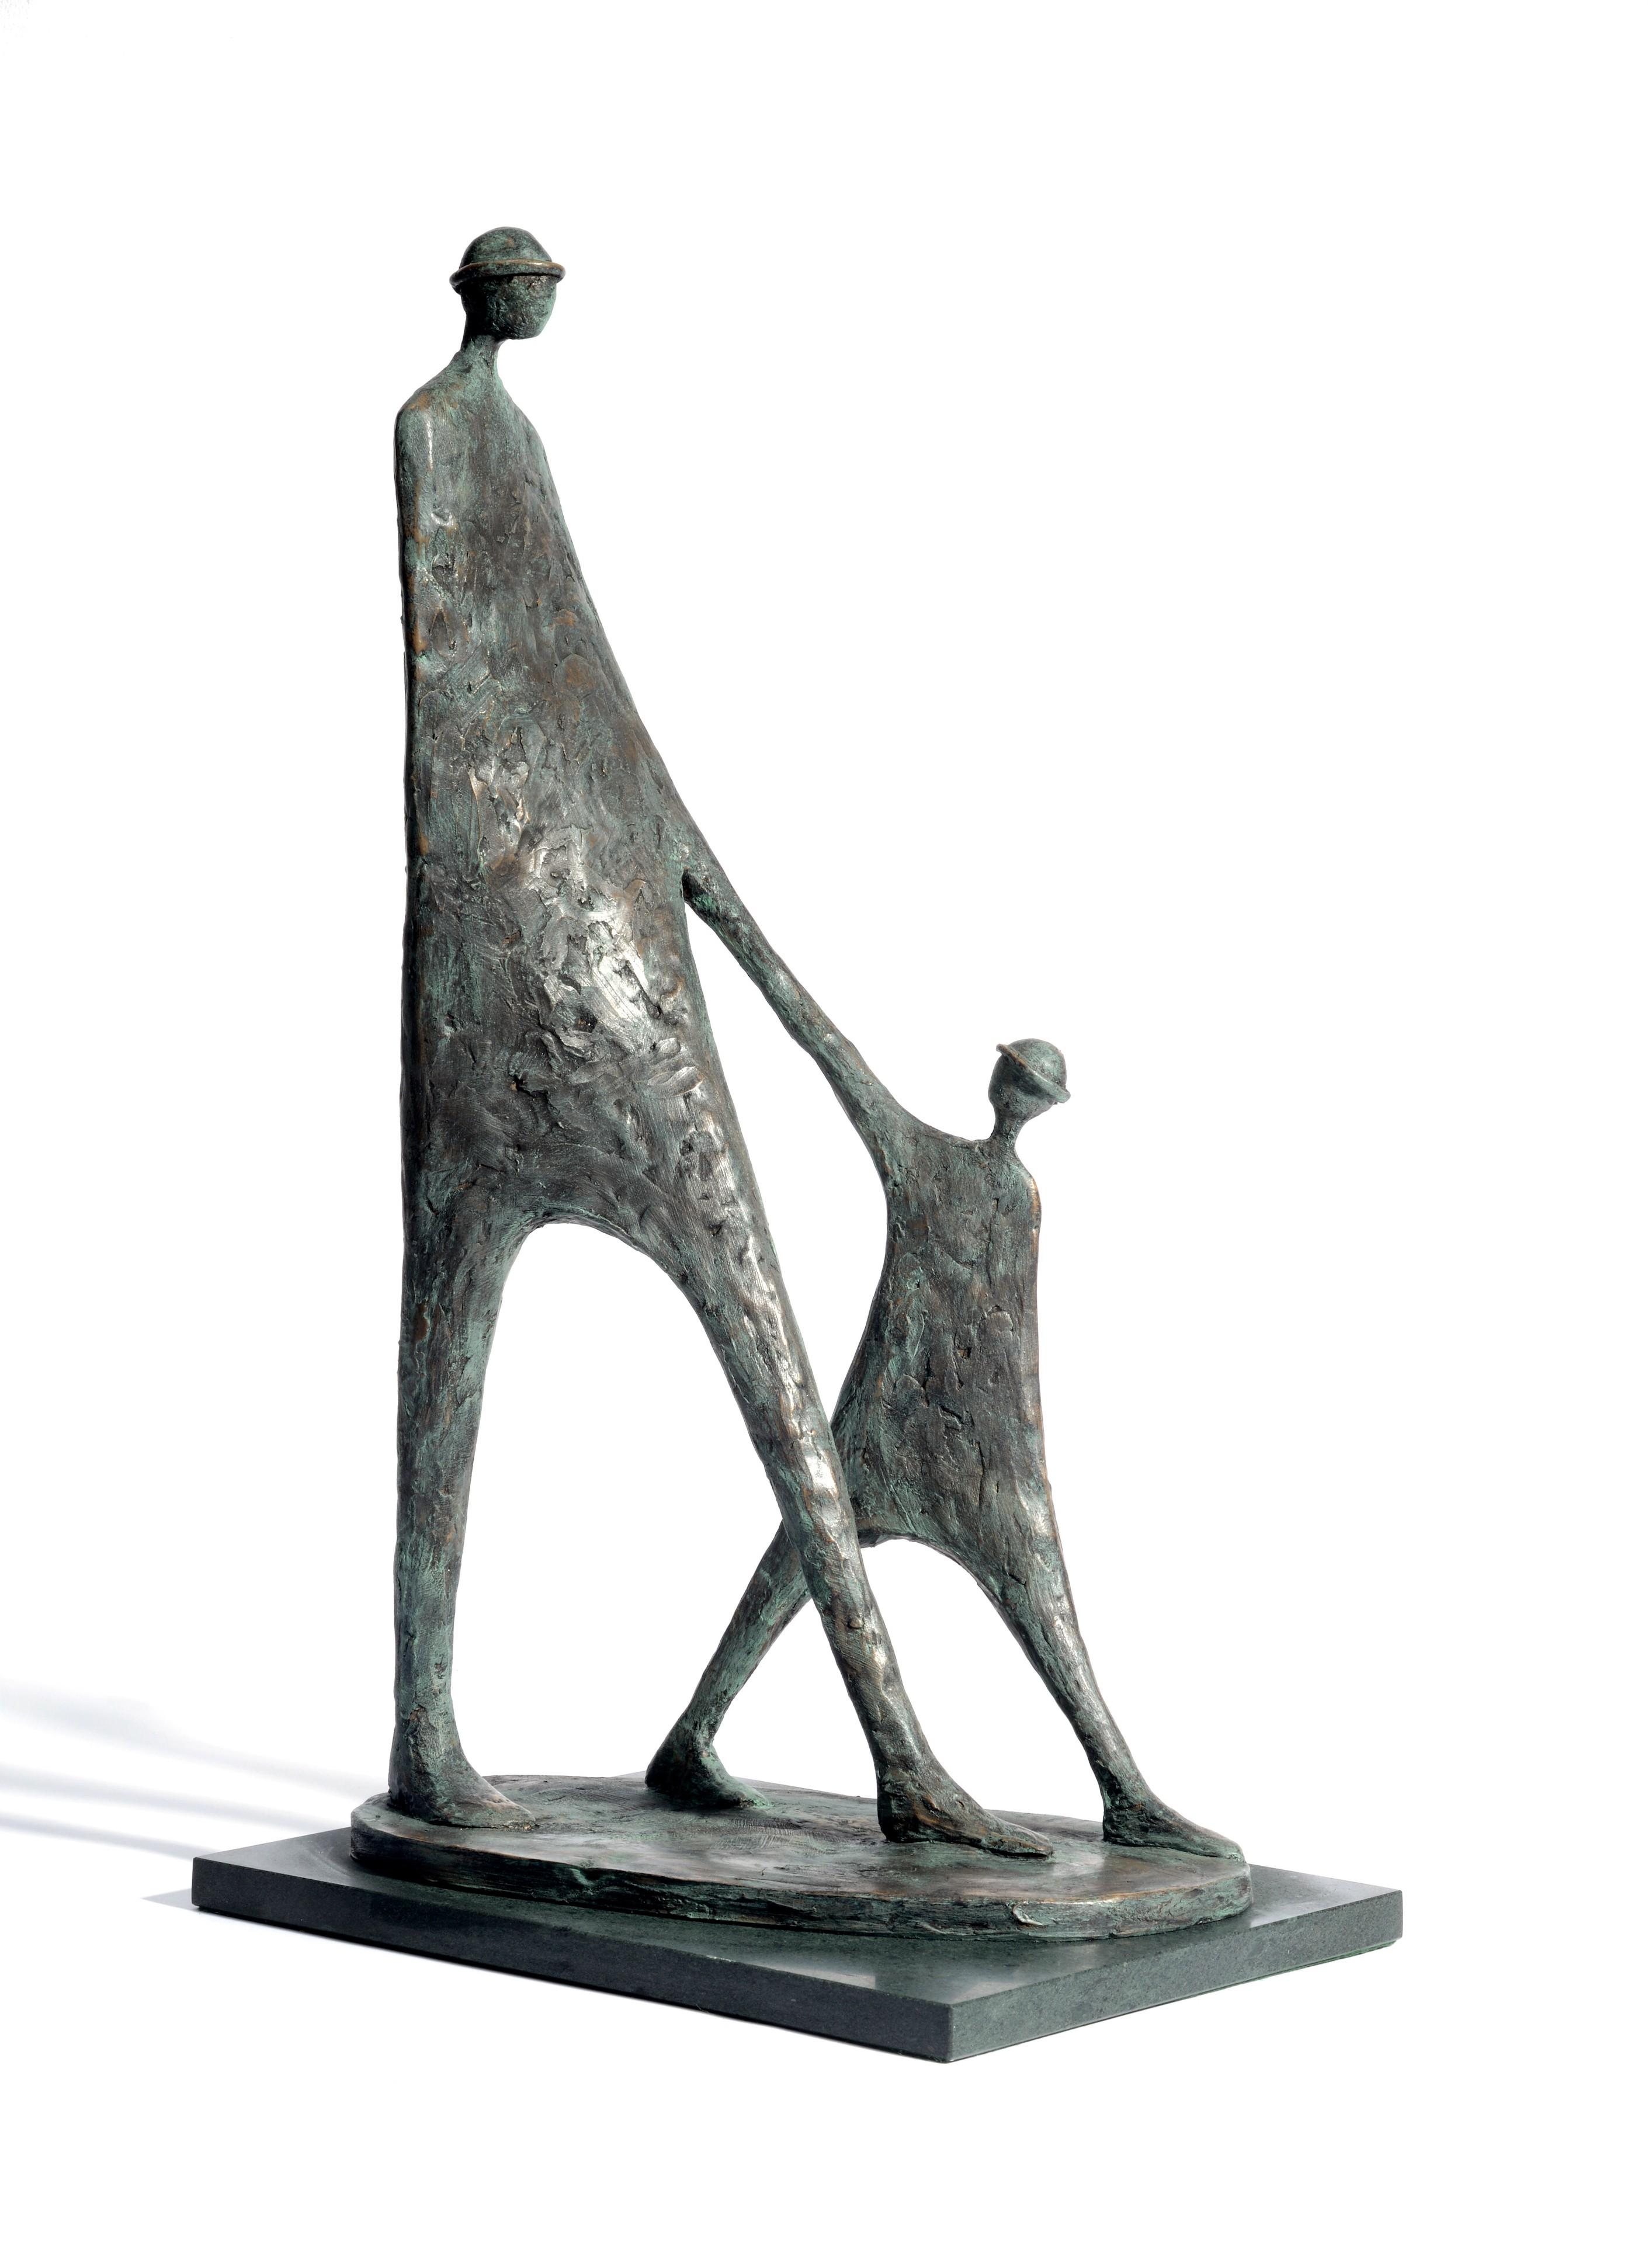 Jennifer Watt, The Walk, 2016, £850, bronze, limited edition of 25, ContemporArti